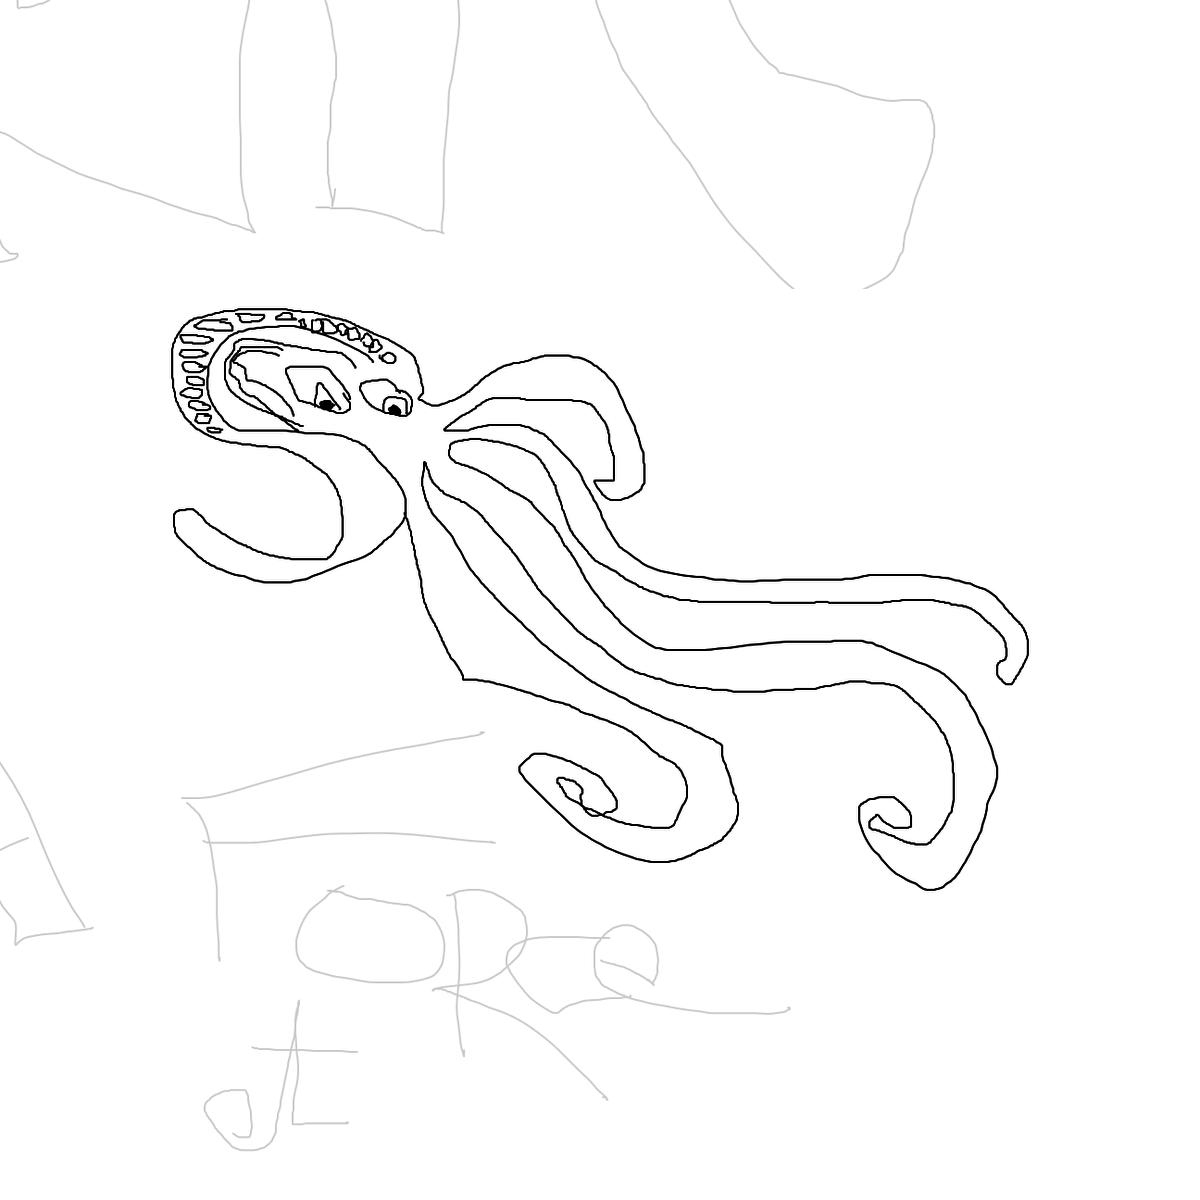 BAAAM drawing#8431 lat:48.8718757629394500lng: 2.3176751136779785